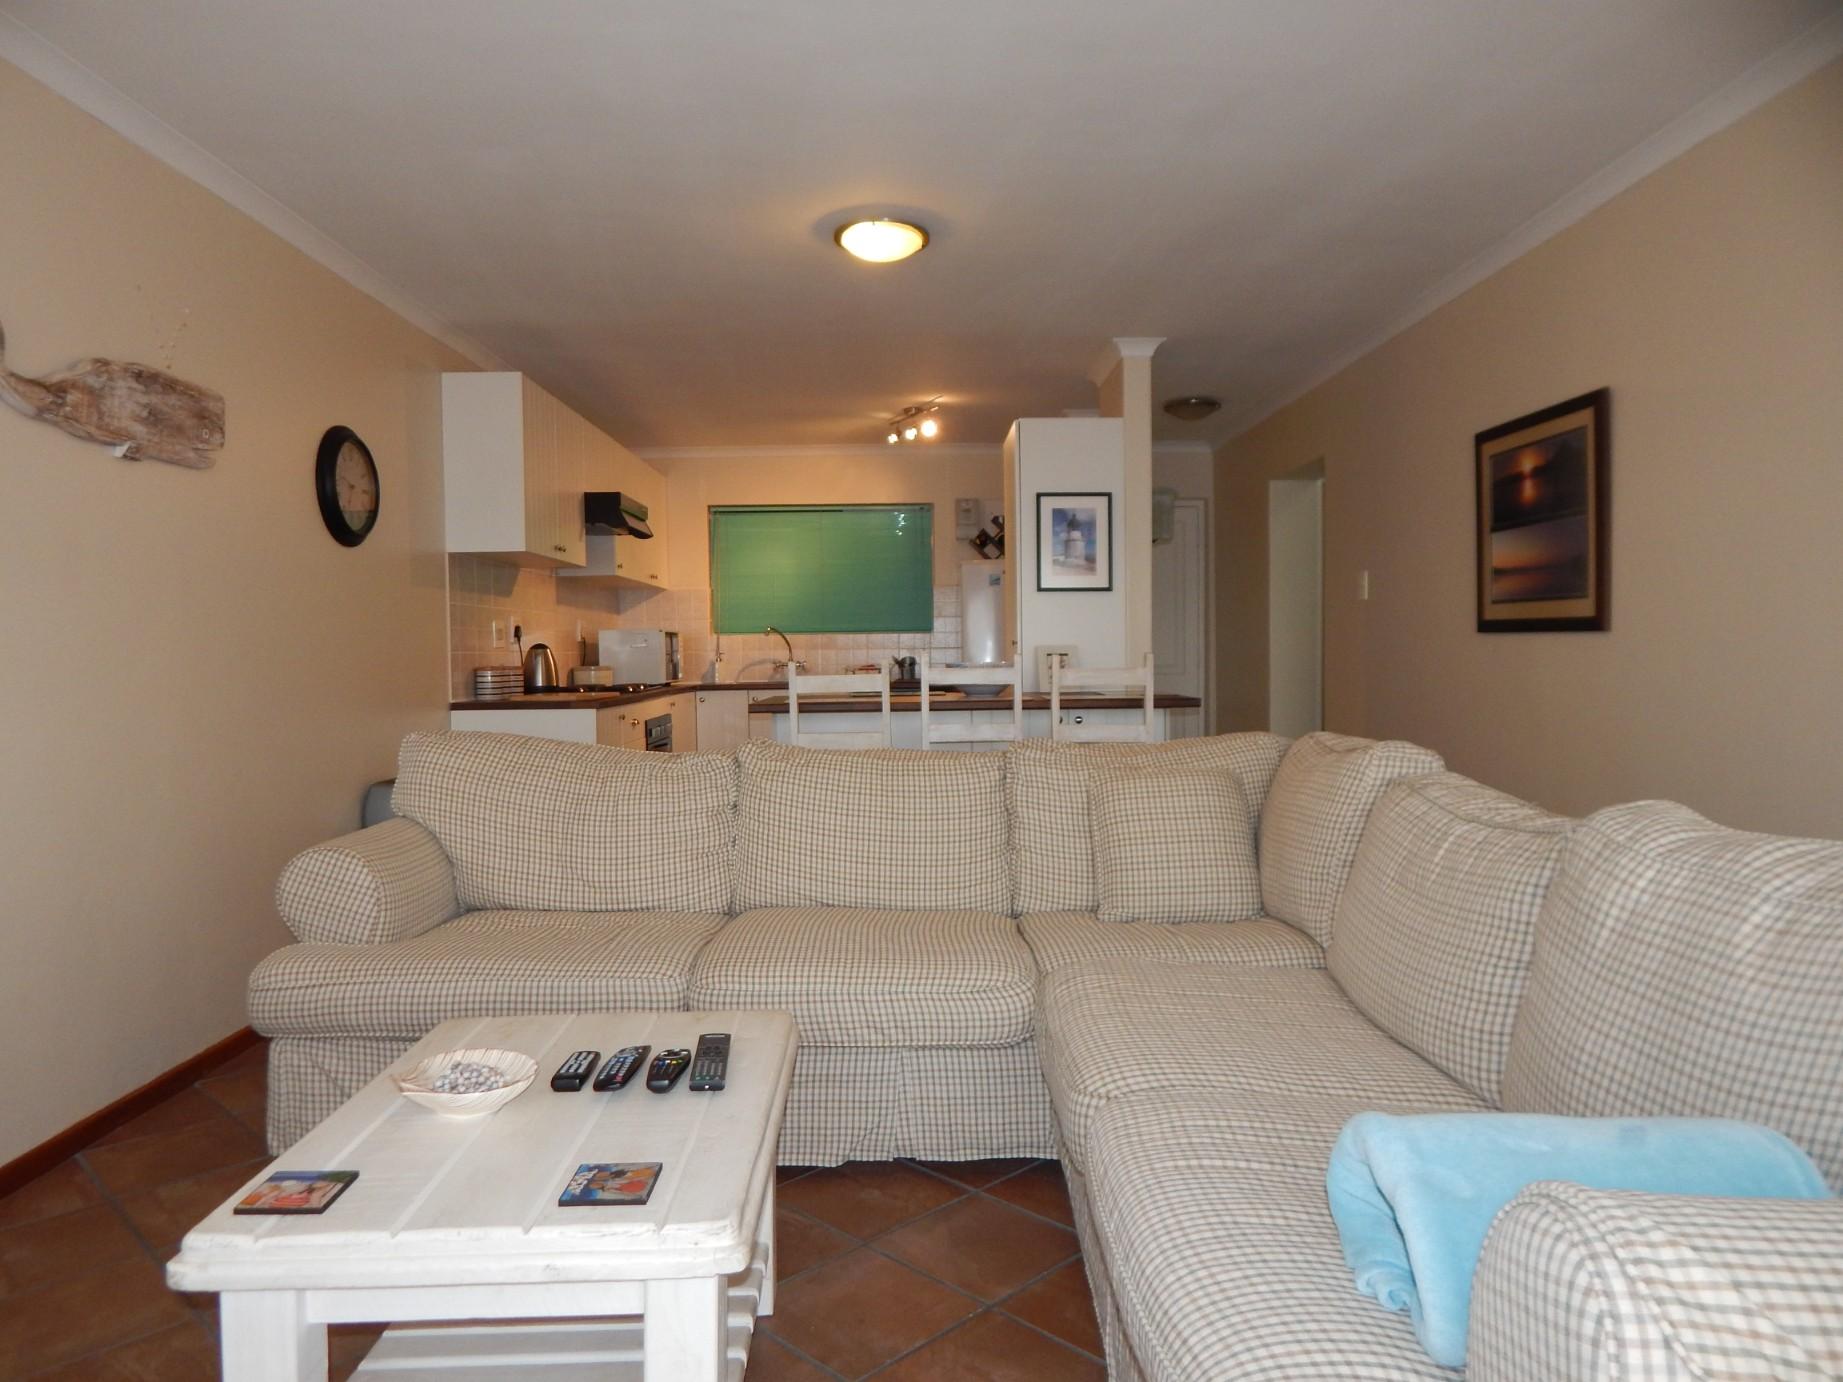 3 Bedroom Apartment for sale in De Bakke ENT0066483 : photo#2